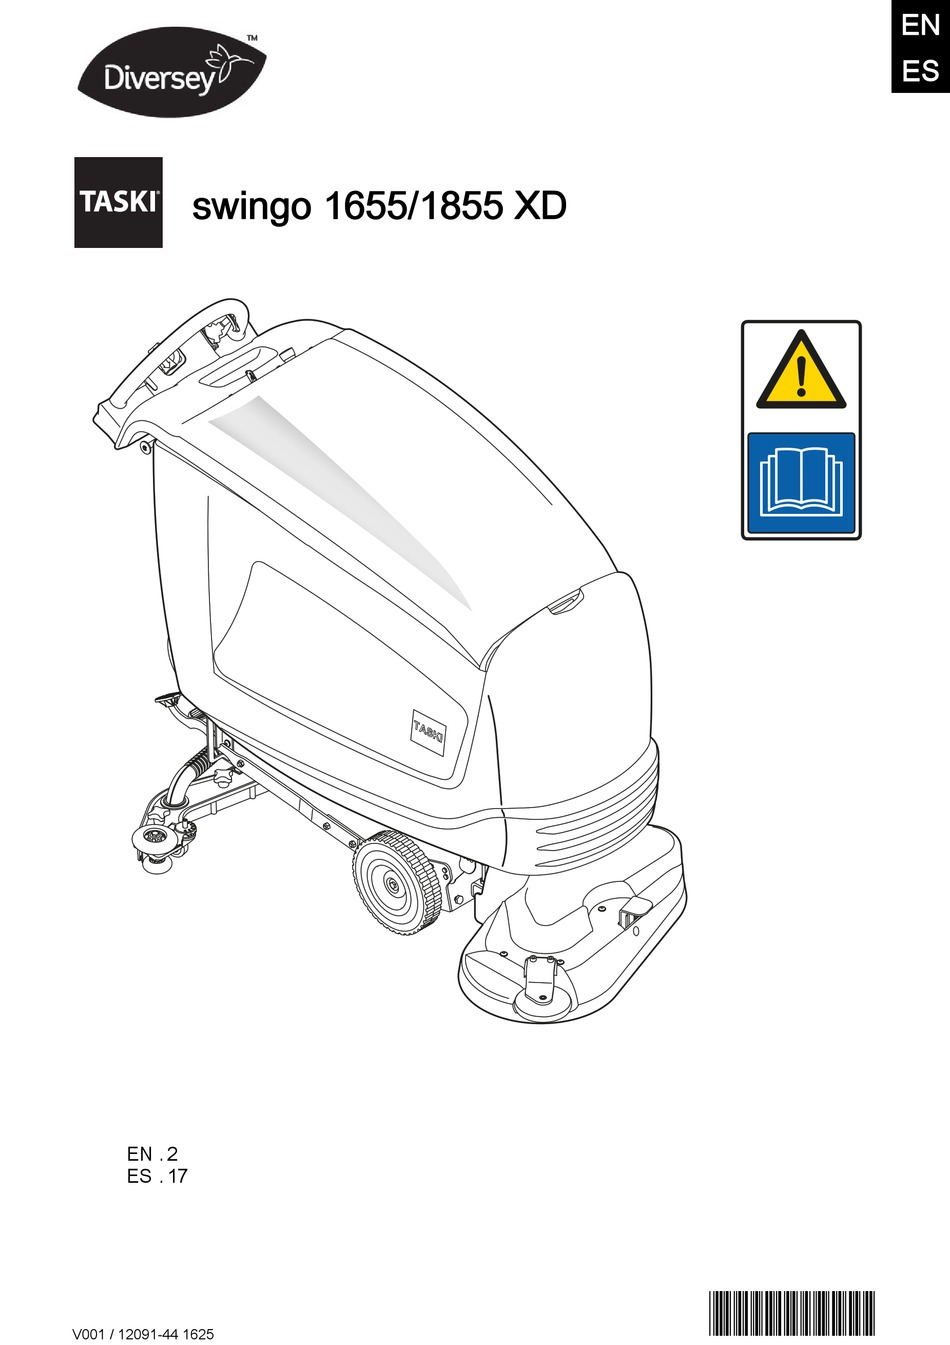 TASKI SWINGO 1855 XD INSTRUCTIONS FOR USE MANUAL Pdf